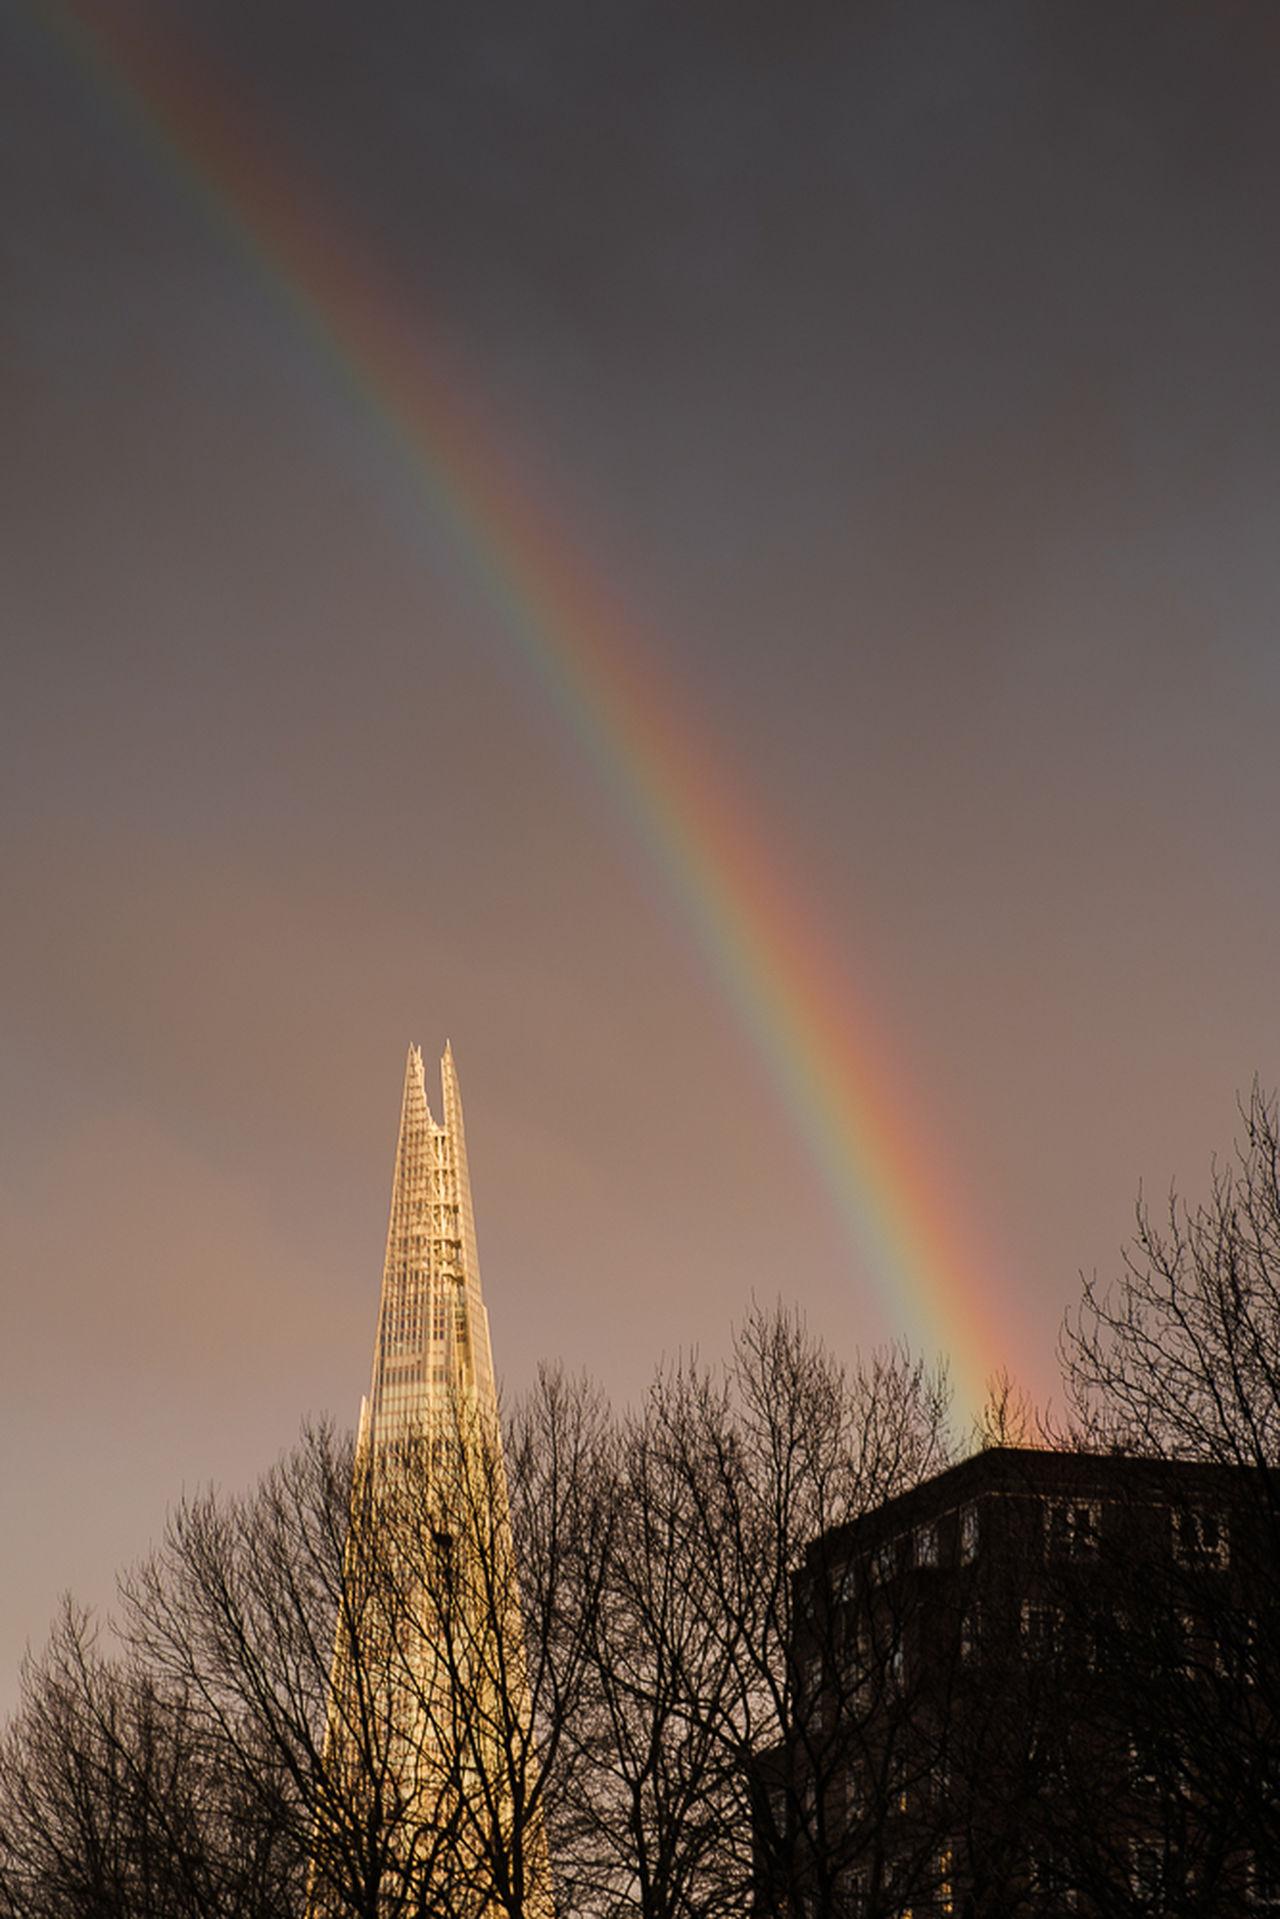 Rainbow over the Shard Beauty In Nature Nature Outdoors Rainbow Shard Sky Street Tranquility Tree Treetop